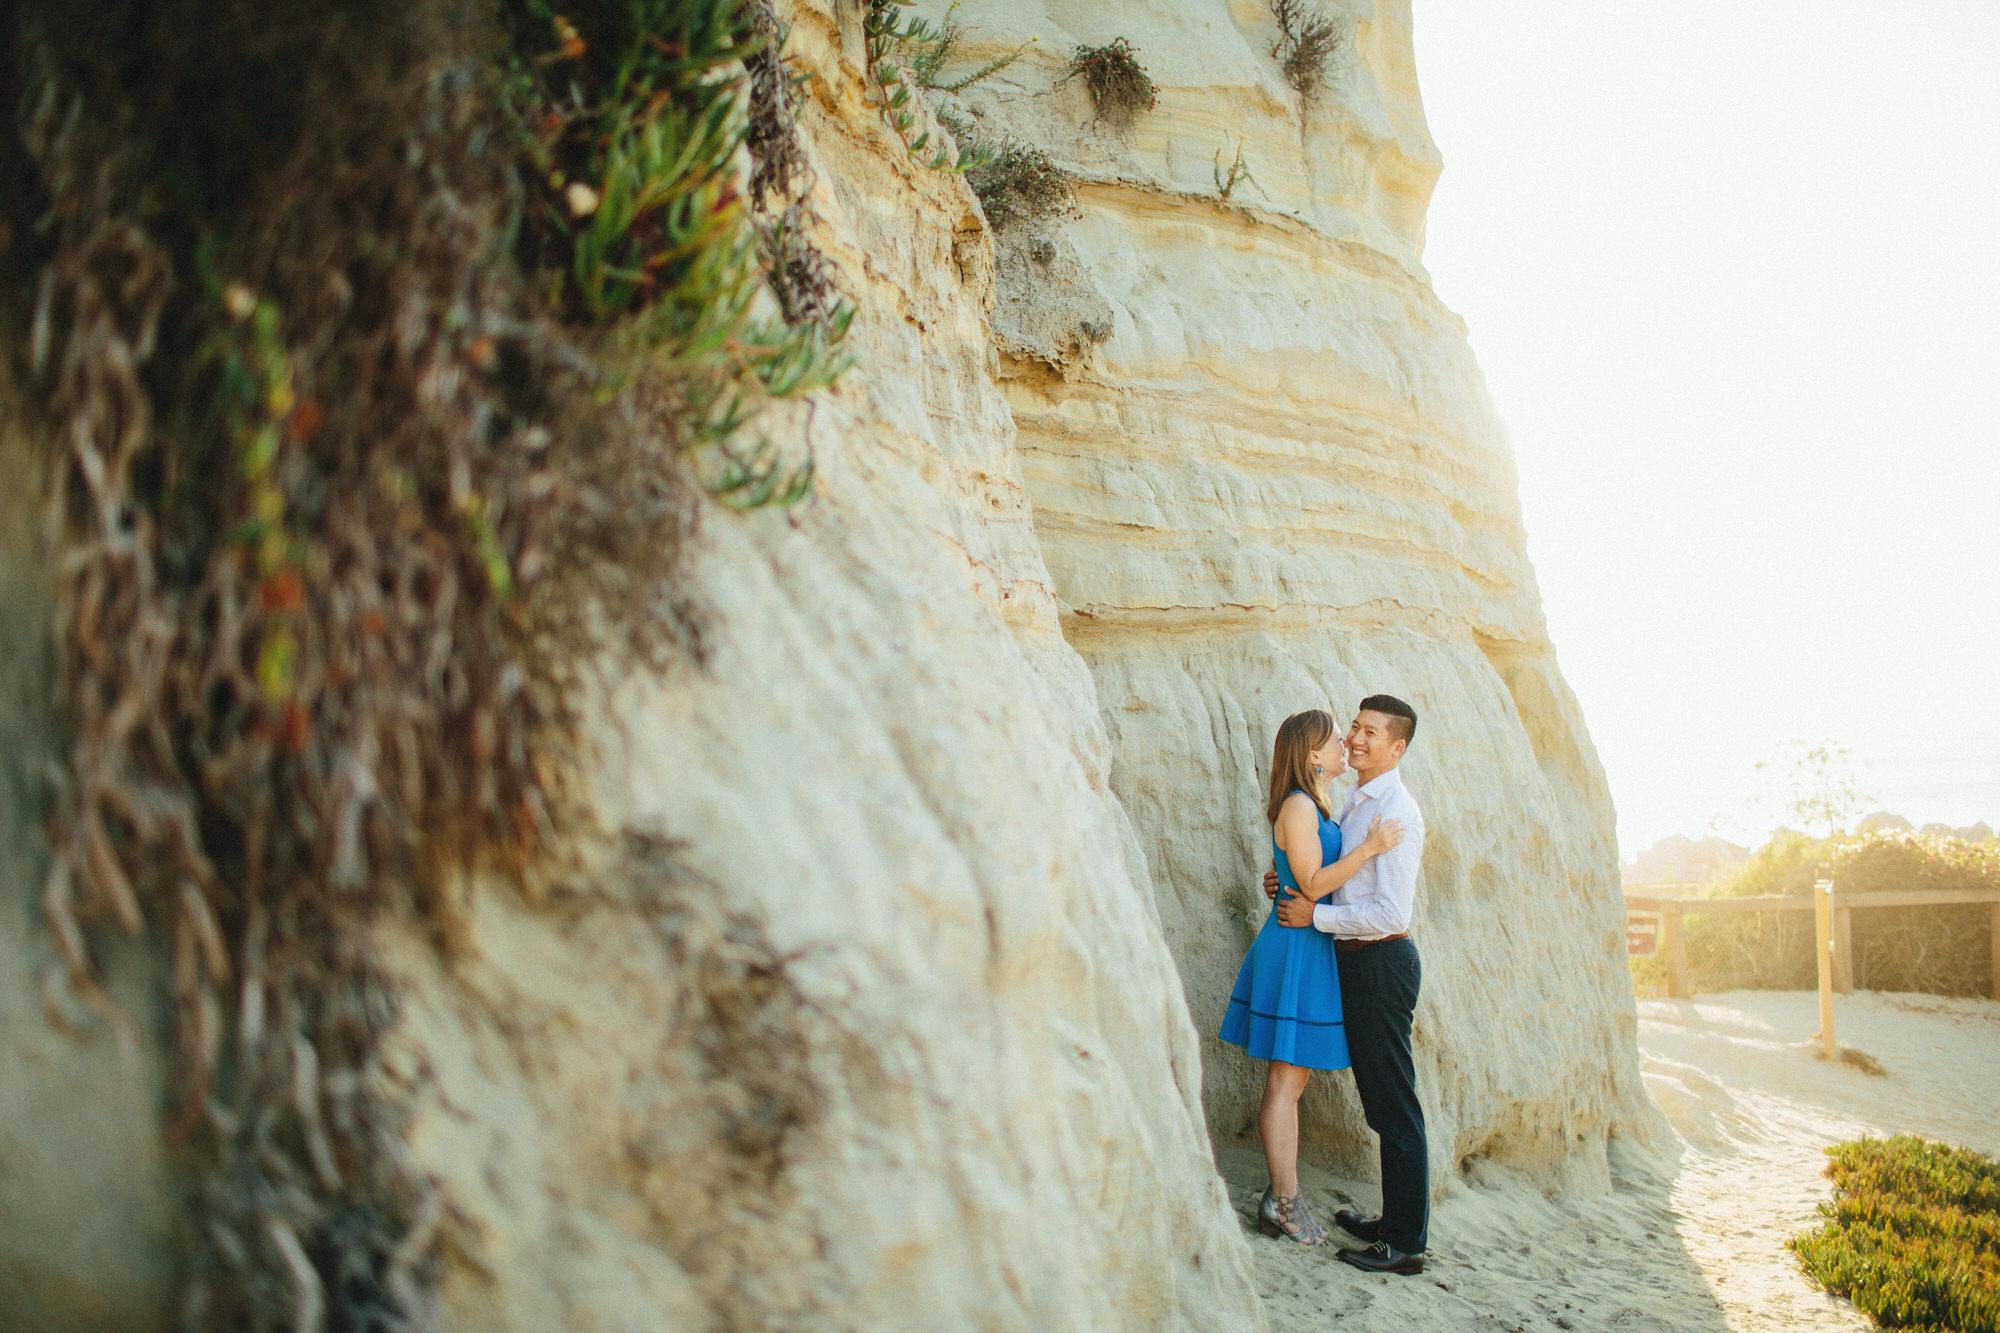 San-Clemente-engagement-03.jpg